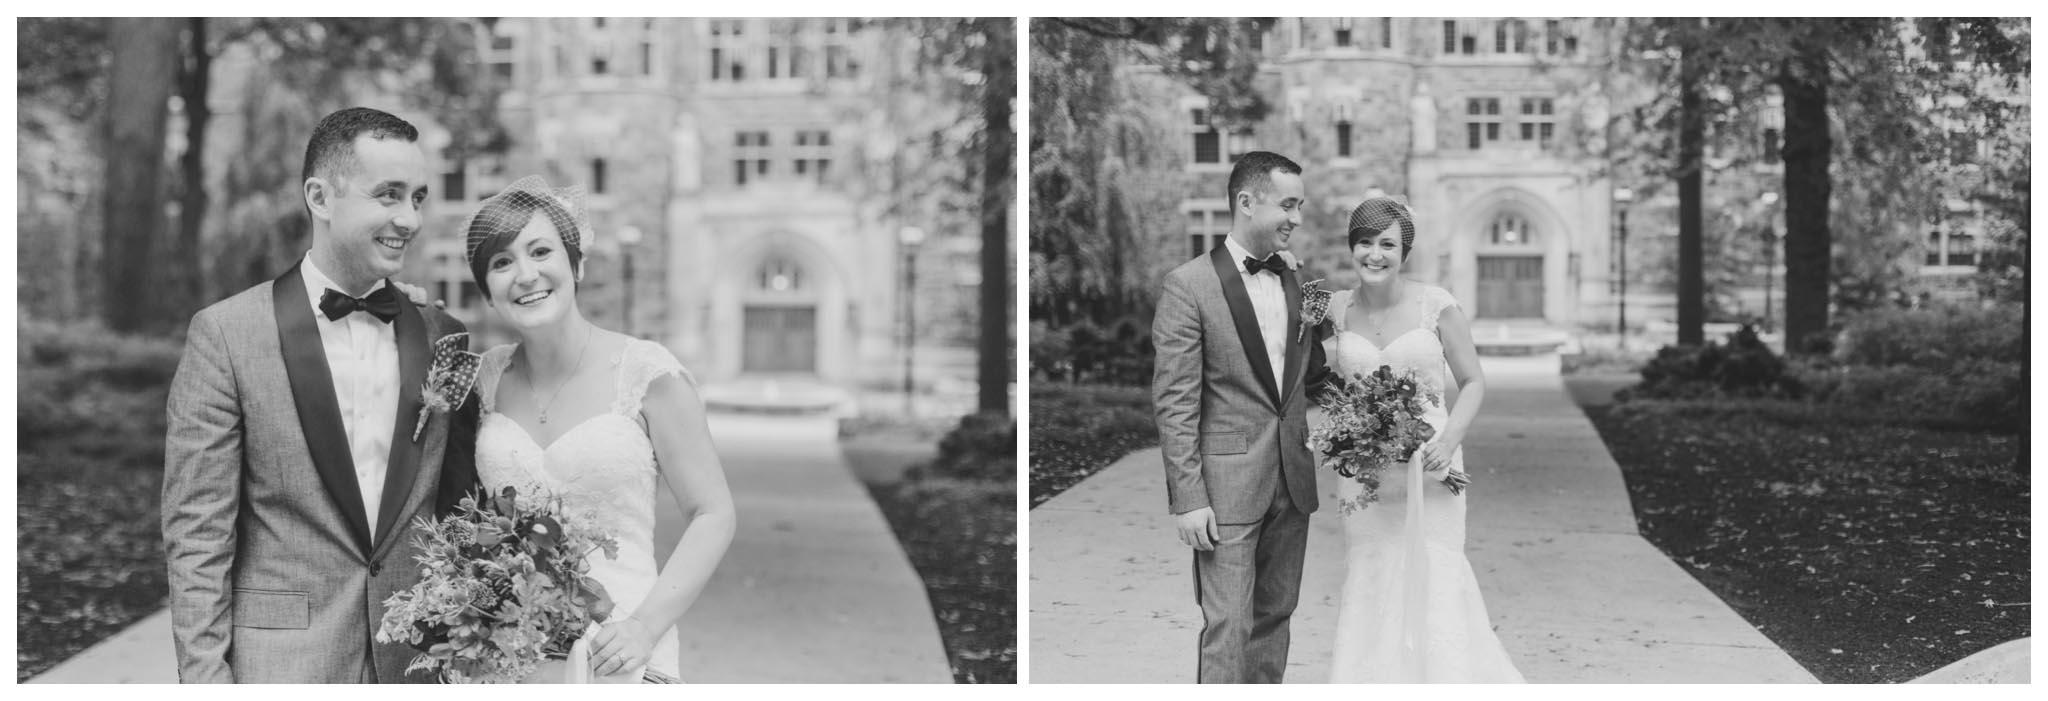 Lehigh University, wedding